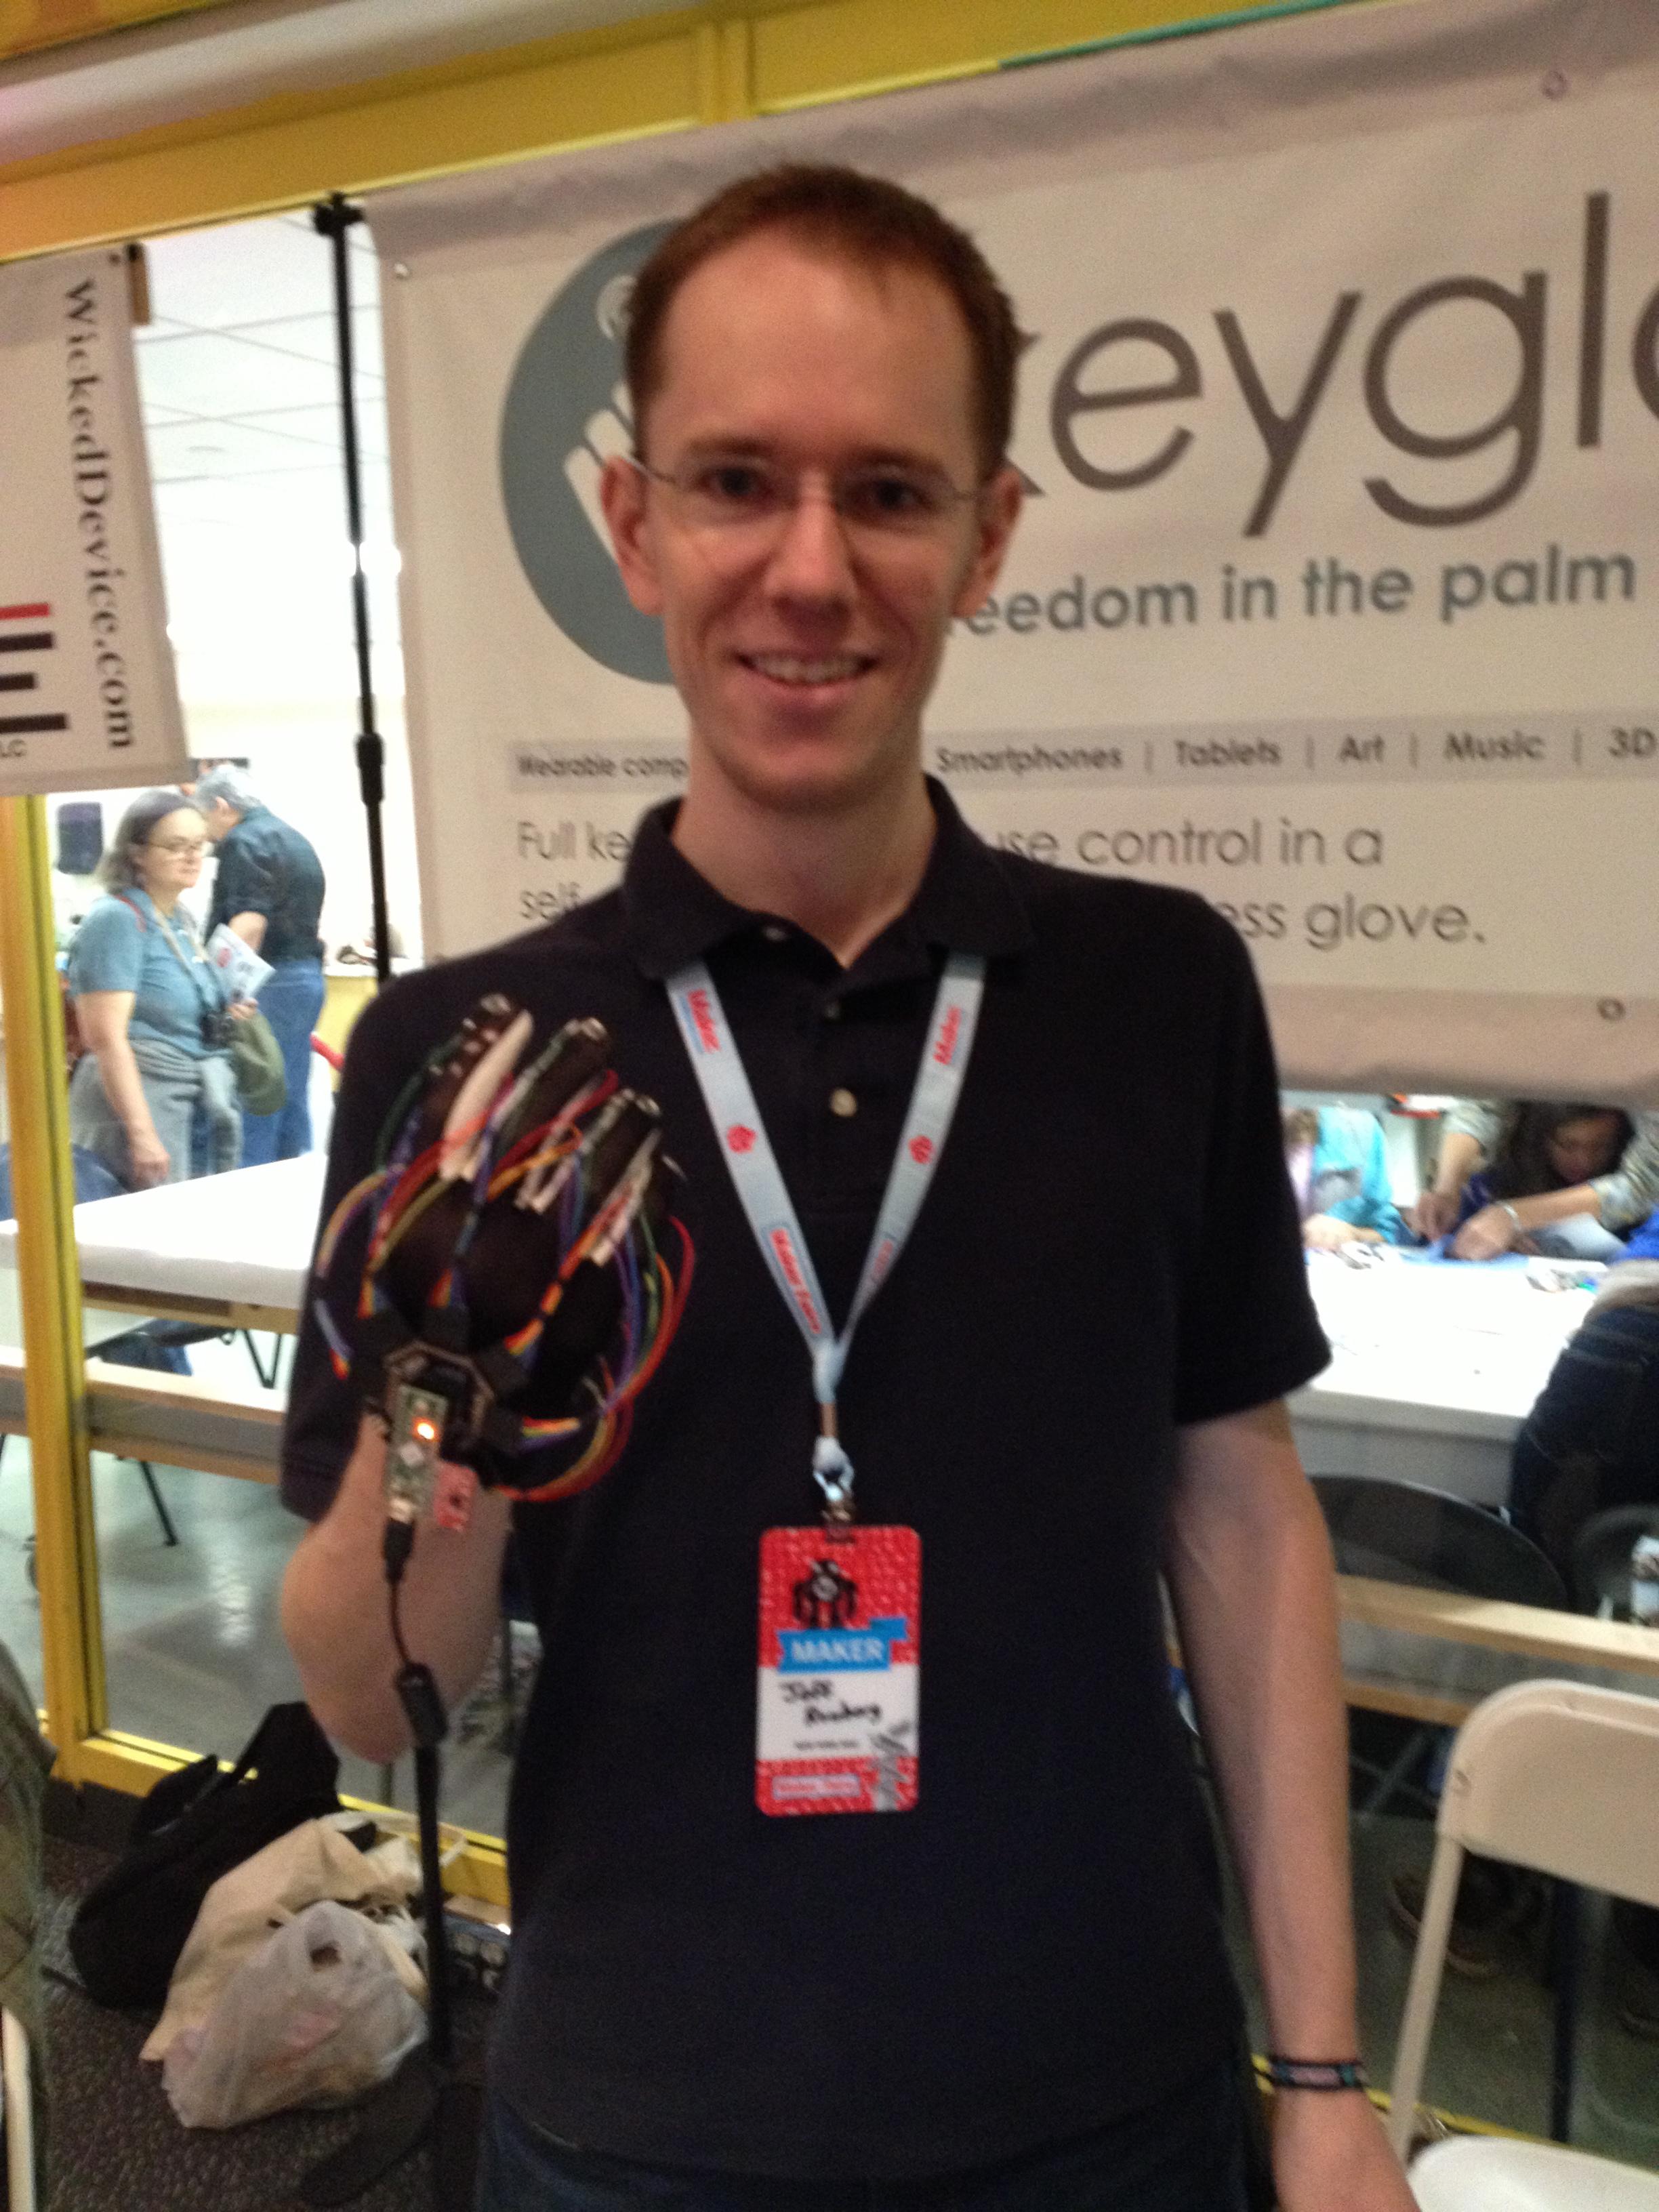 Maker Faire New York: Keyglove Gestural Input Device